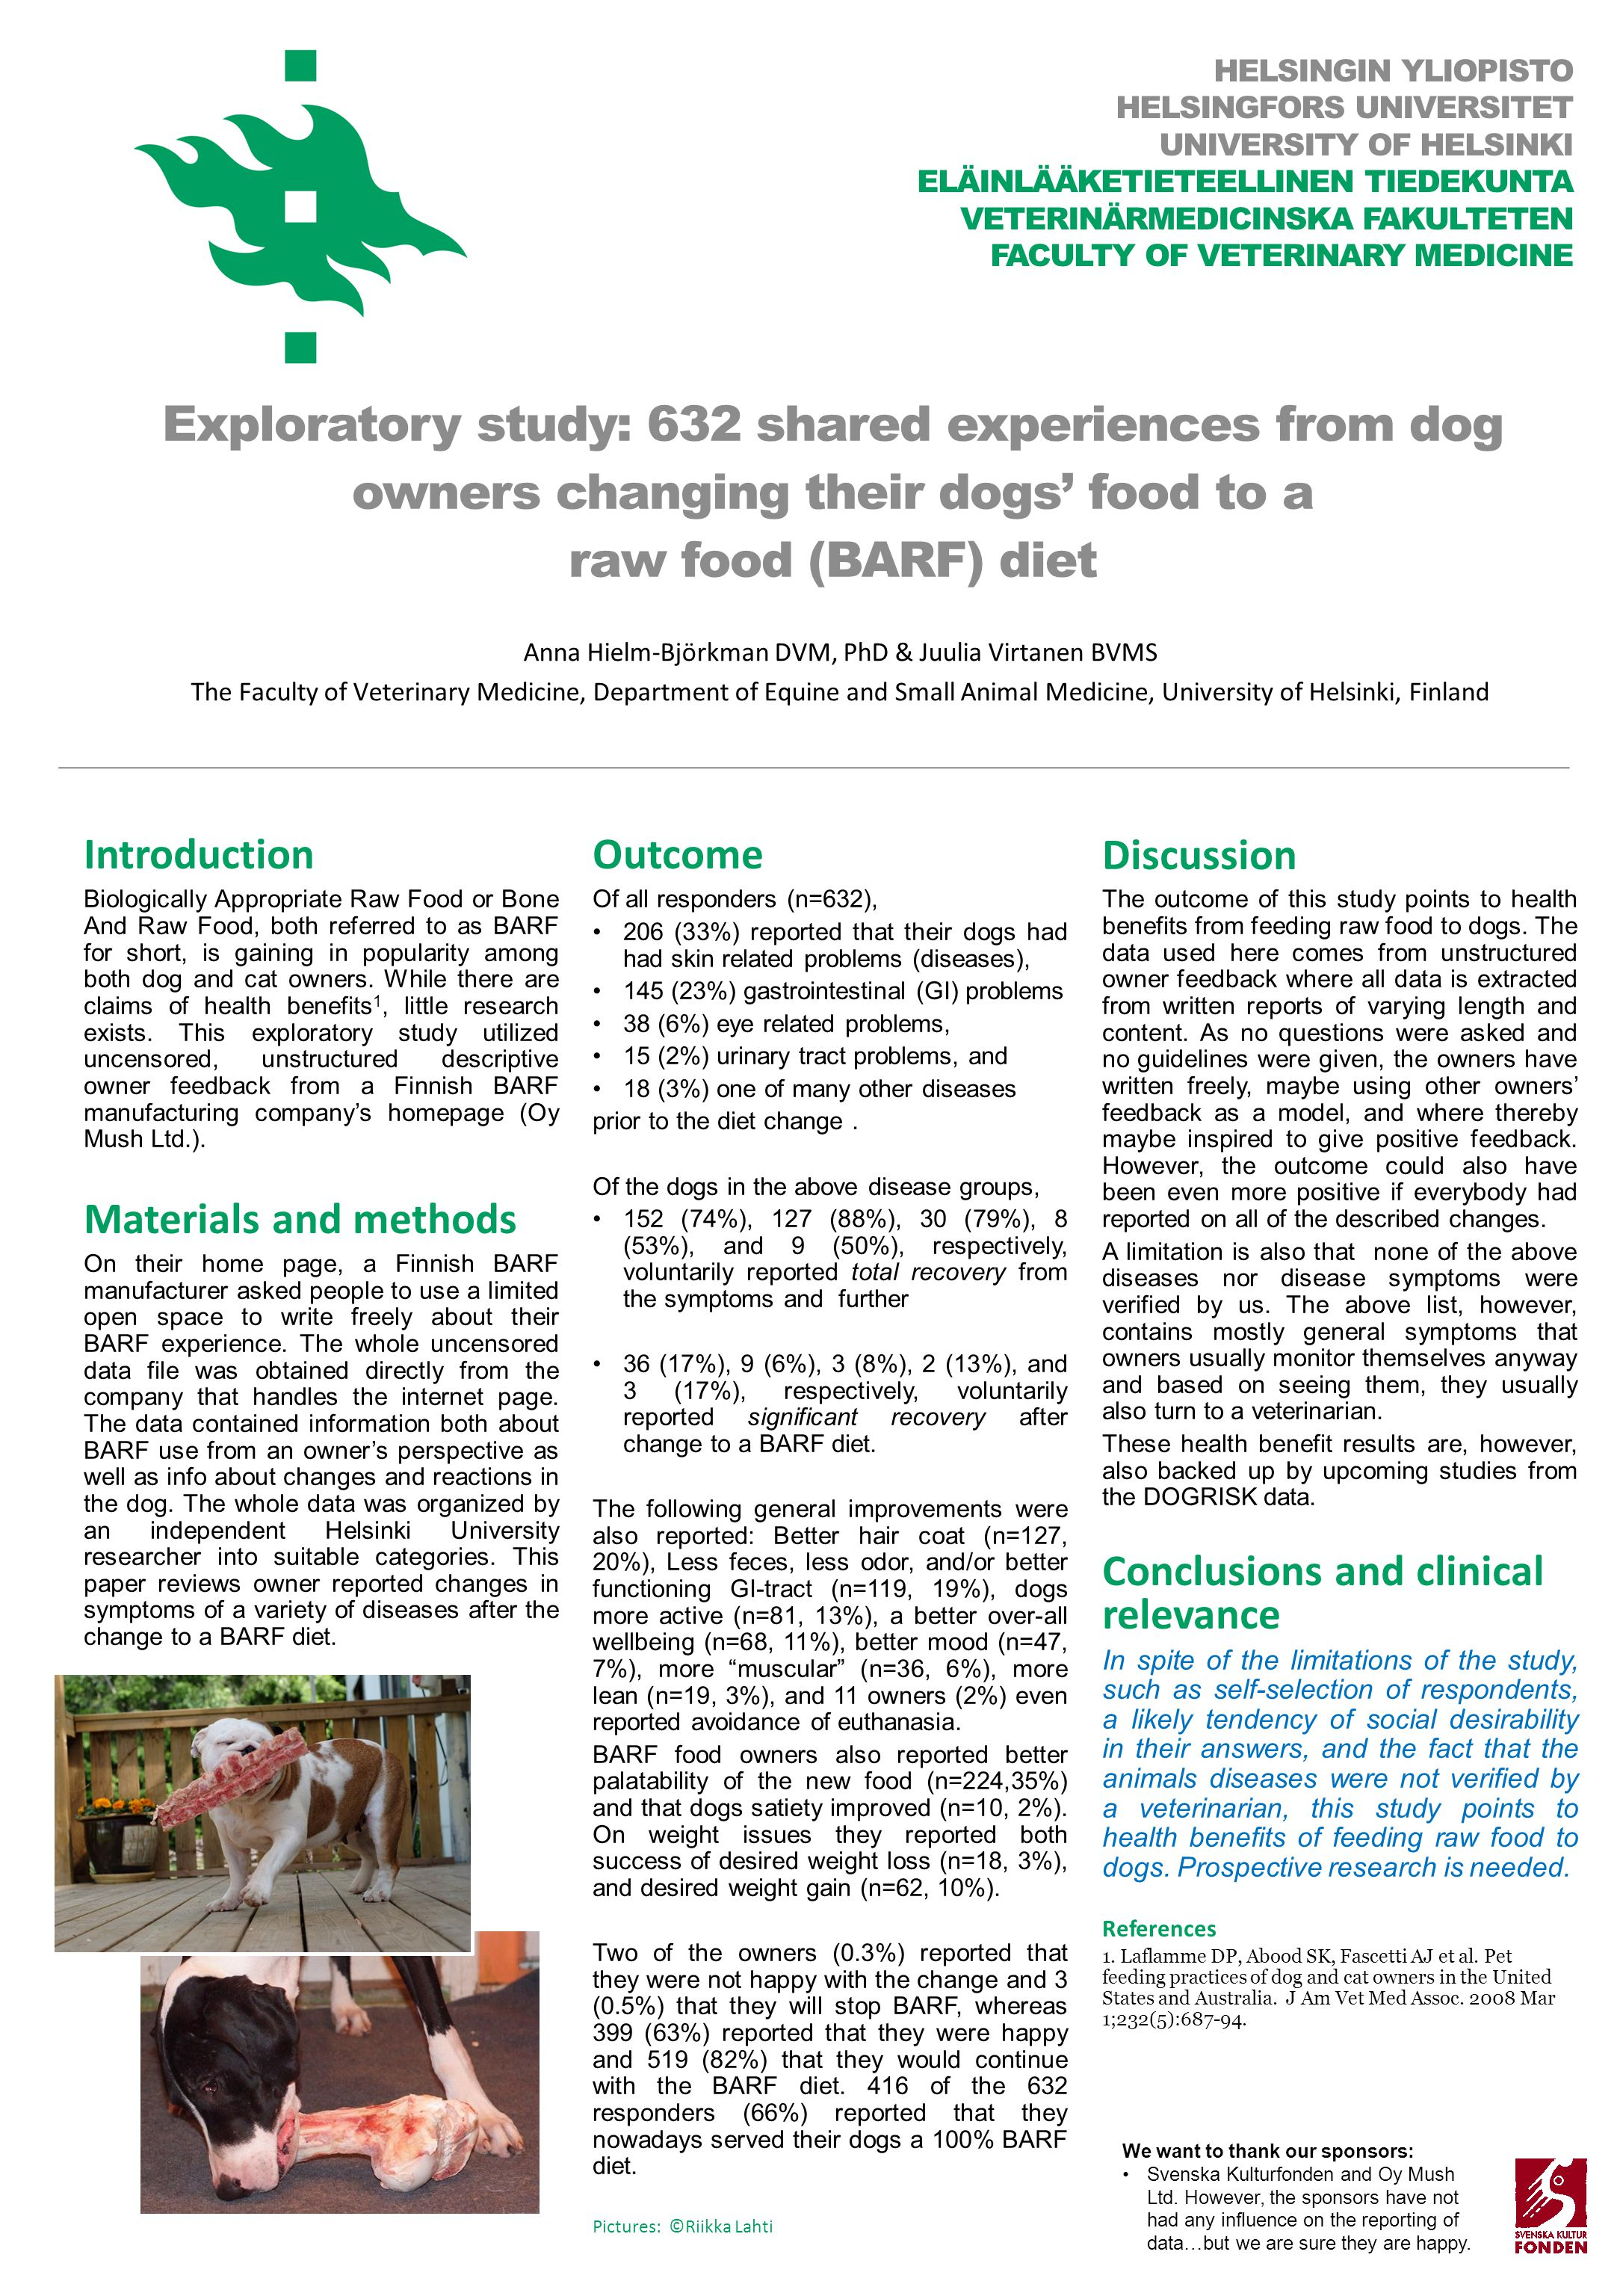 HELSINGIN YLIOPISTO HELSINGFORS UNIVERSITET UNIVERSITY OF HELSINKI ELÄINLÄÄKETIETEELLINEN TIEDEKUNTA VETERINÄRMEDICINSKA FAKULTETEN FACULTY OF VETERINARY MEDICINE Introduction Biologically Appropriate Raw Food or Bone And Raw Food, both referred to as BARF for short, is gaining in popularity among both dog and cat owners.